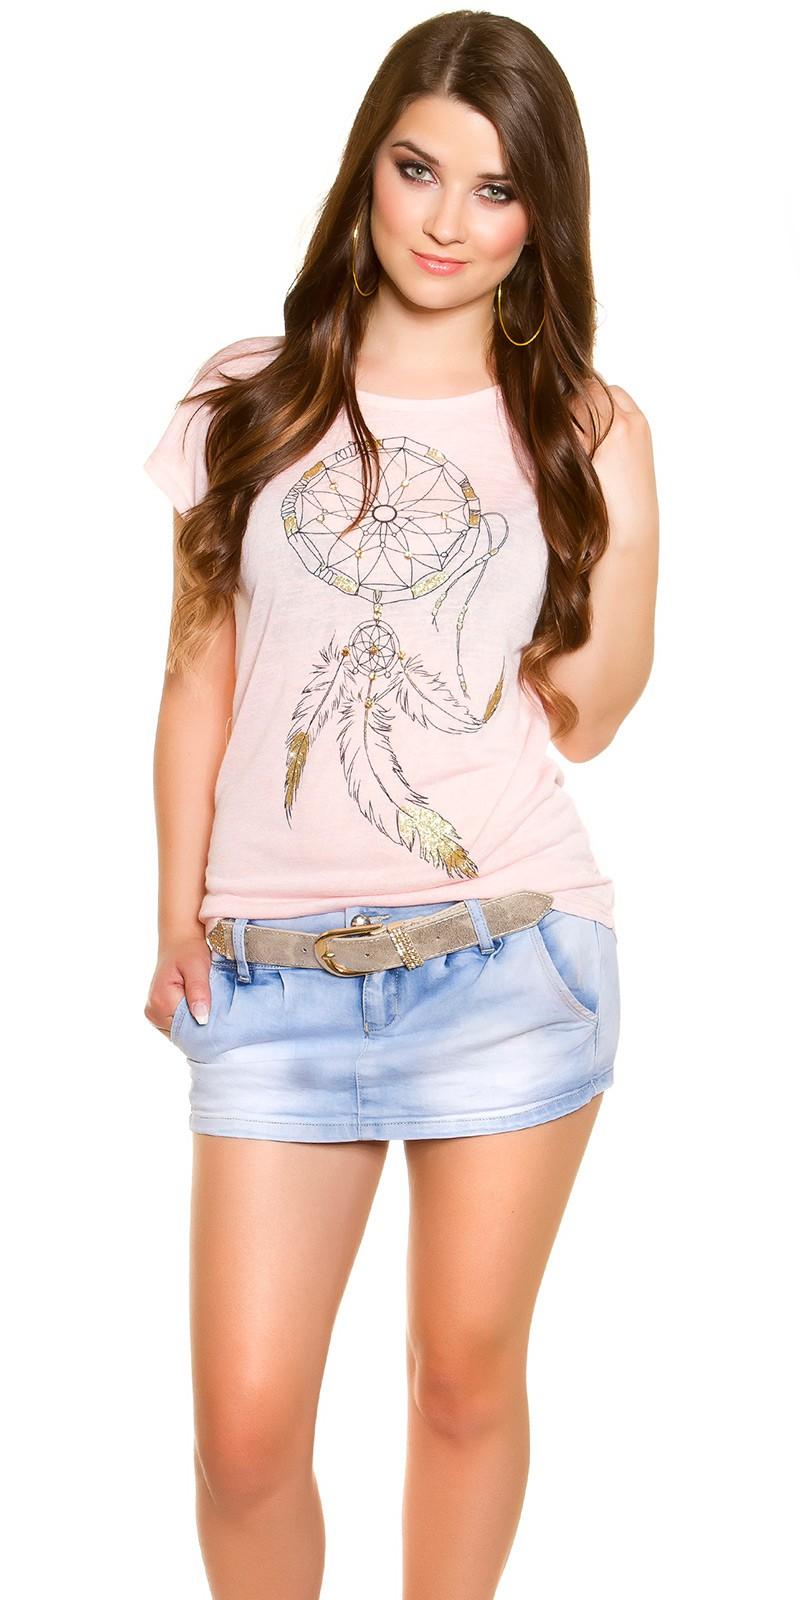 la moda Shirt cu dreamcatcher imprimeu